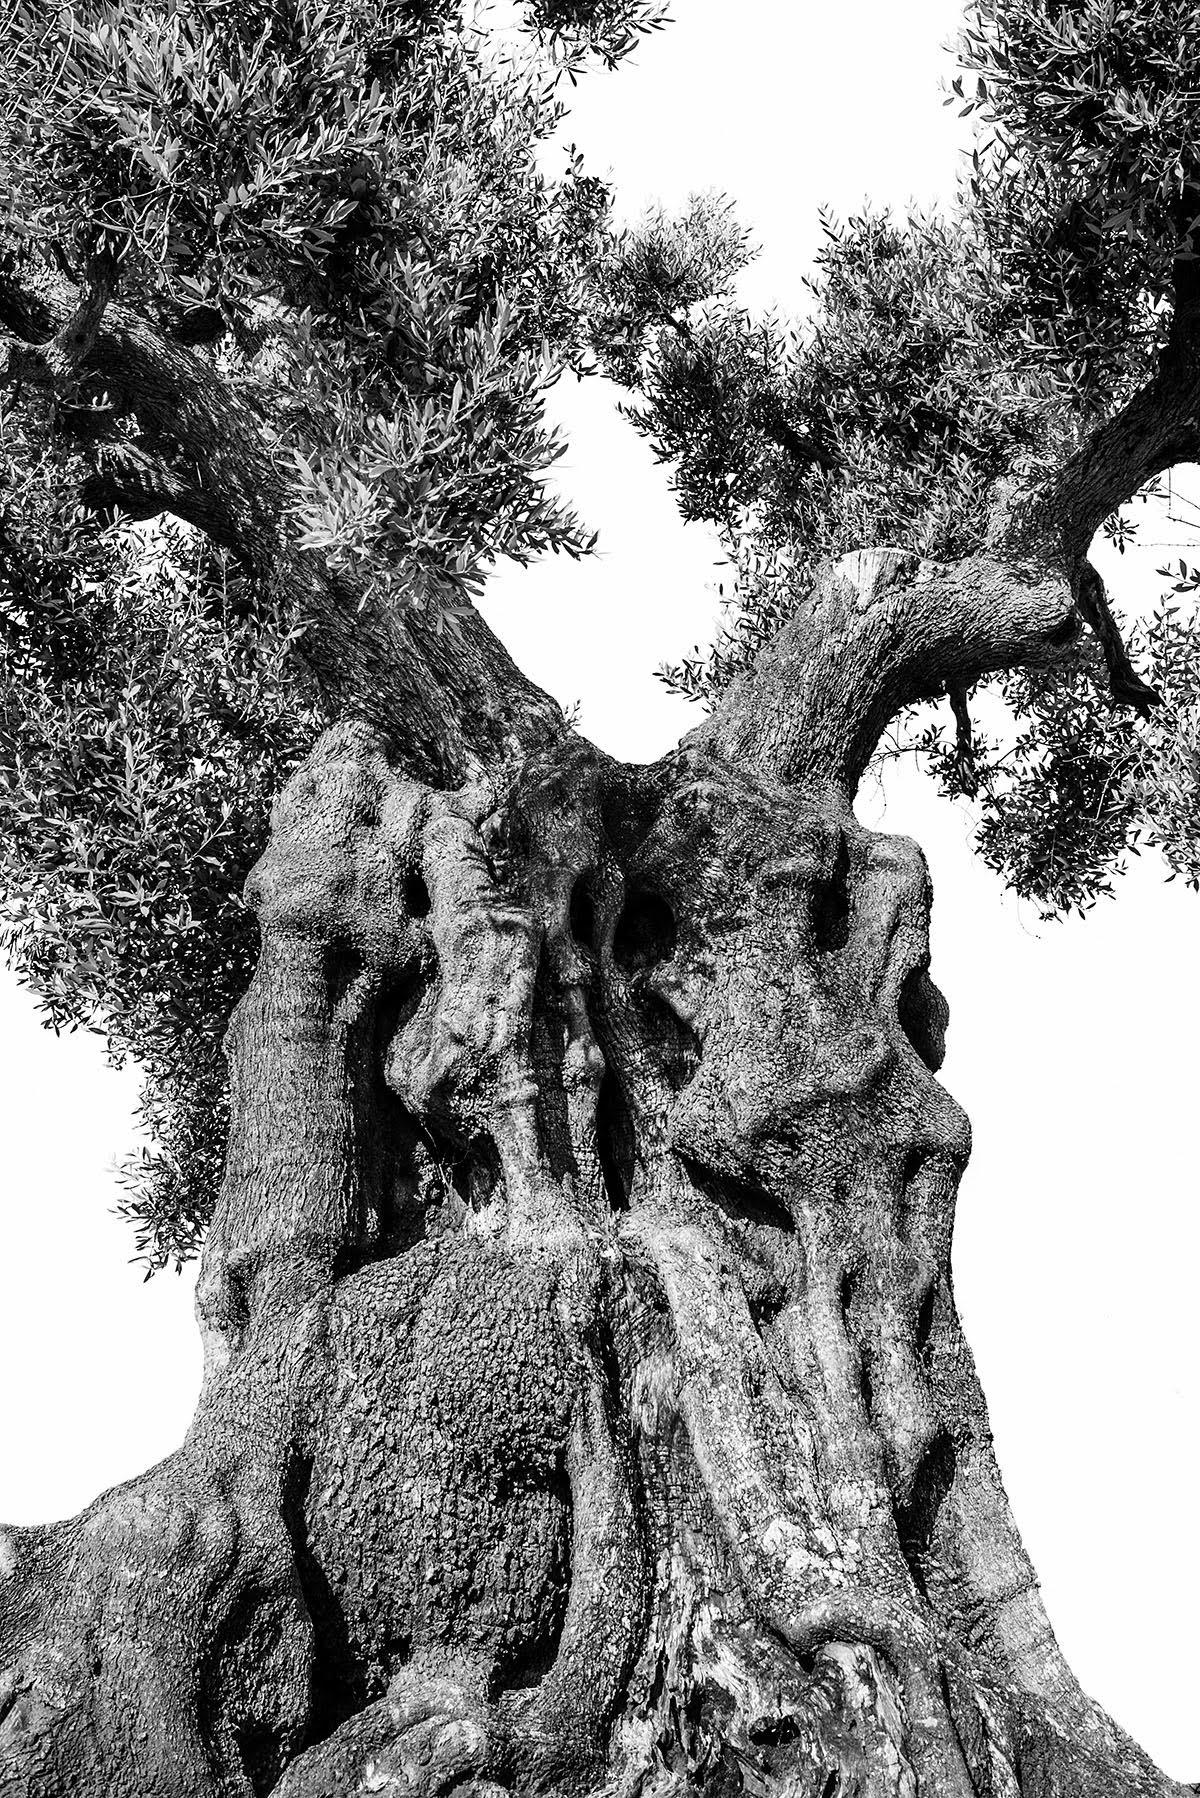 martin-ogolter-Monumentali-nature-landscape-photographer-05